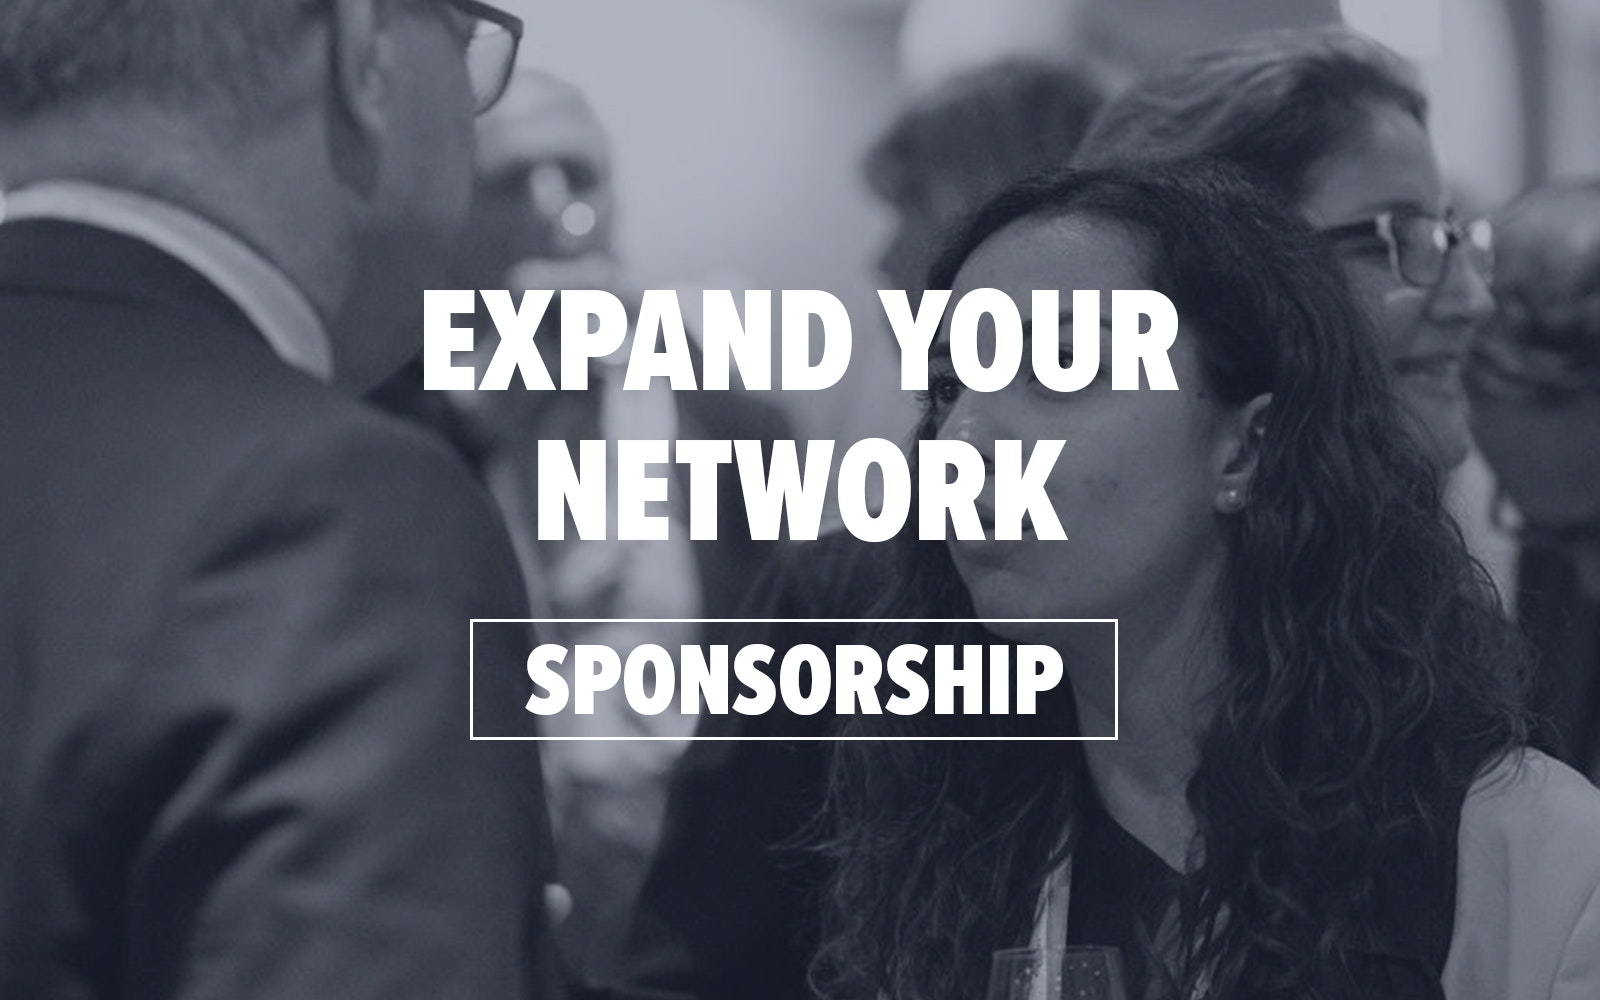 Sponsorship & exhibiting opportunities